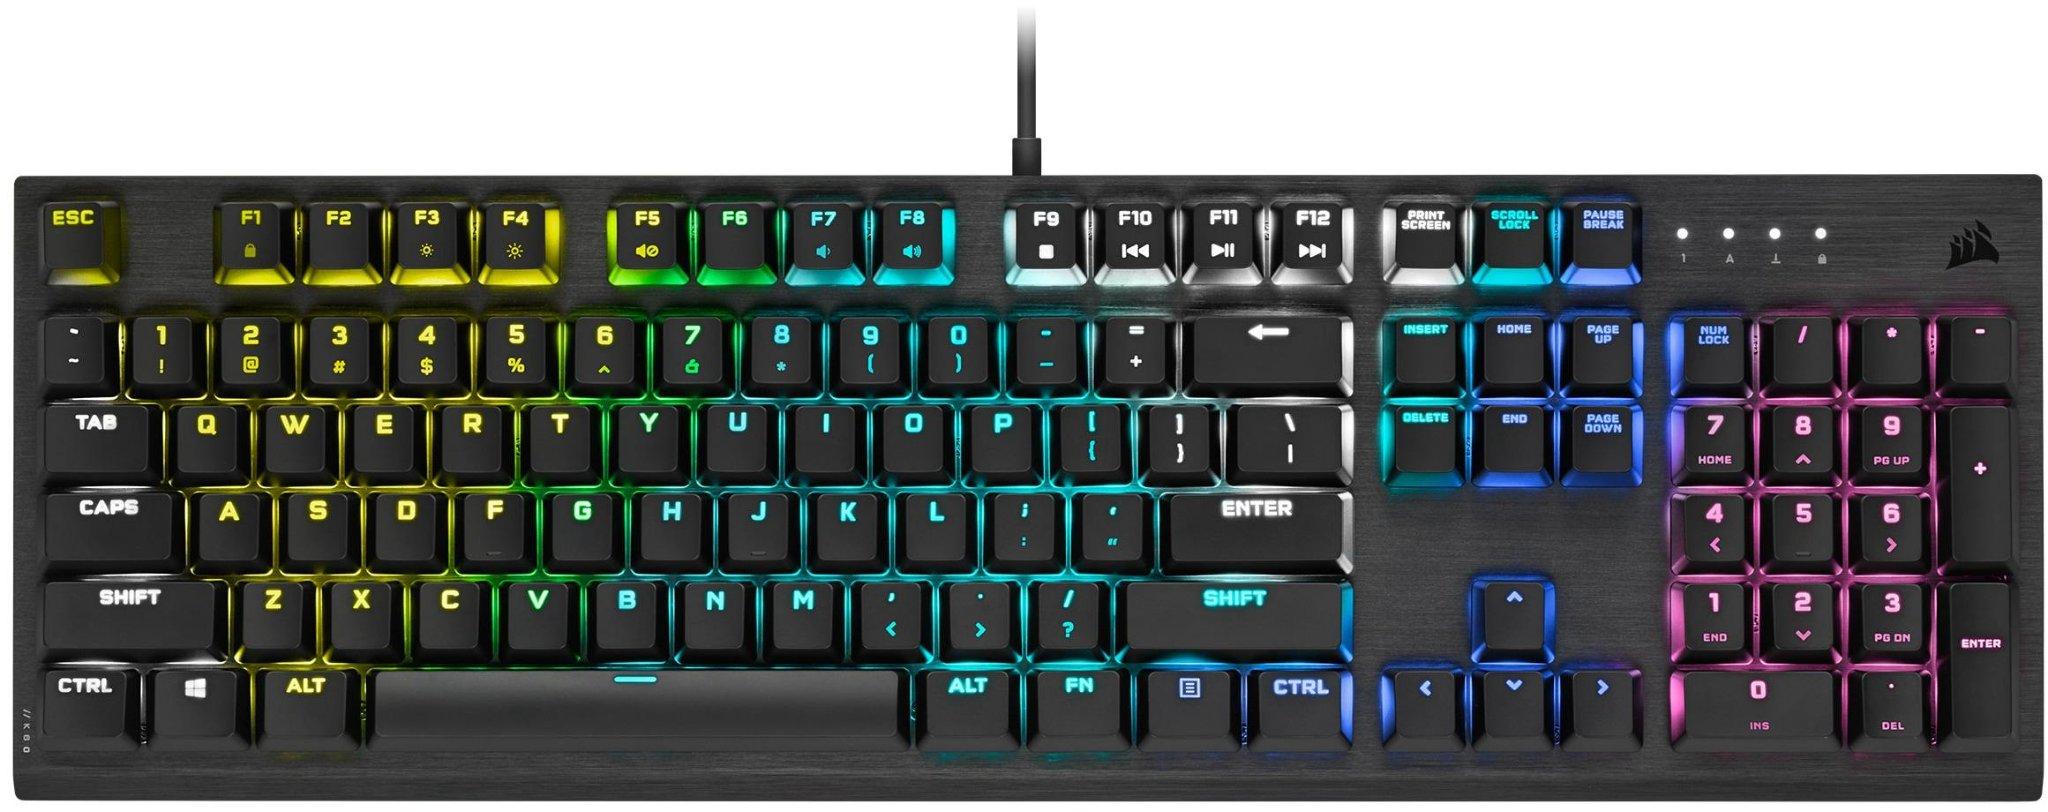 Kjøpe Corsair K60 RGB PRO Mekansik Tastatur [MX Viola] på